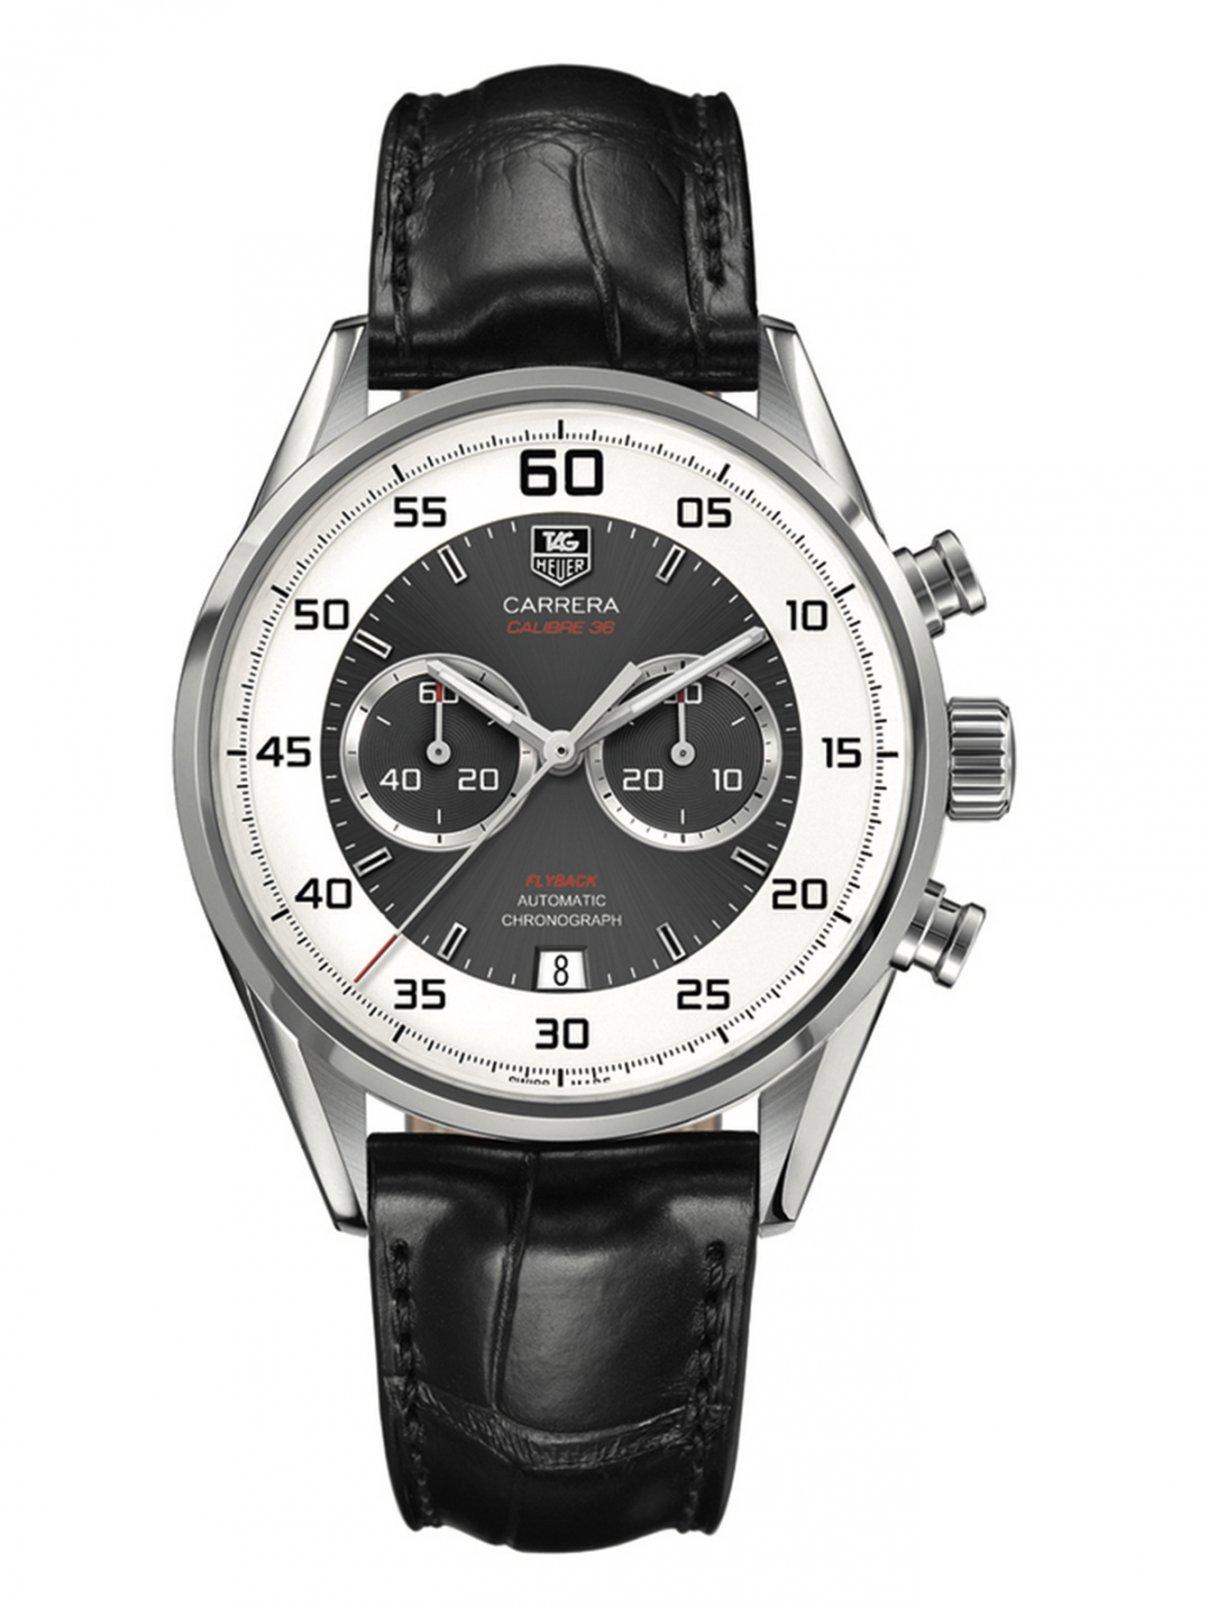 Часы CAR2B11.FC6235 Carrera TAG Heuer  –  Общий вид